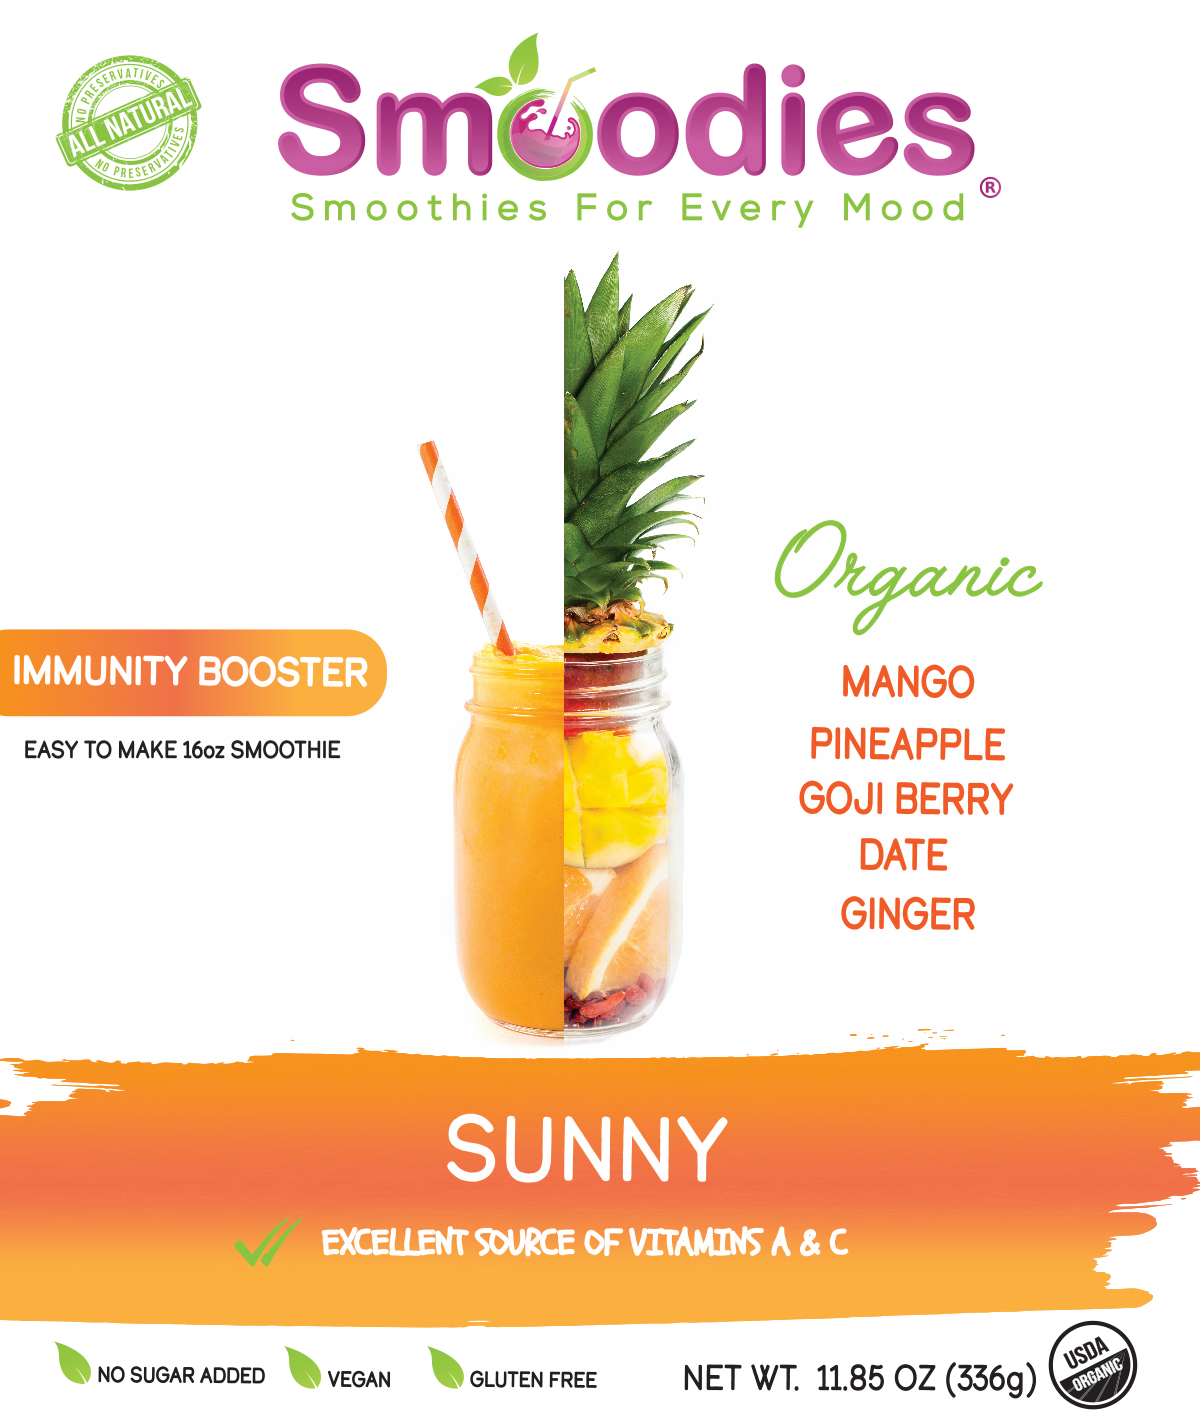 Smoodies Label